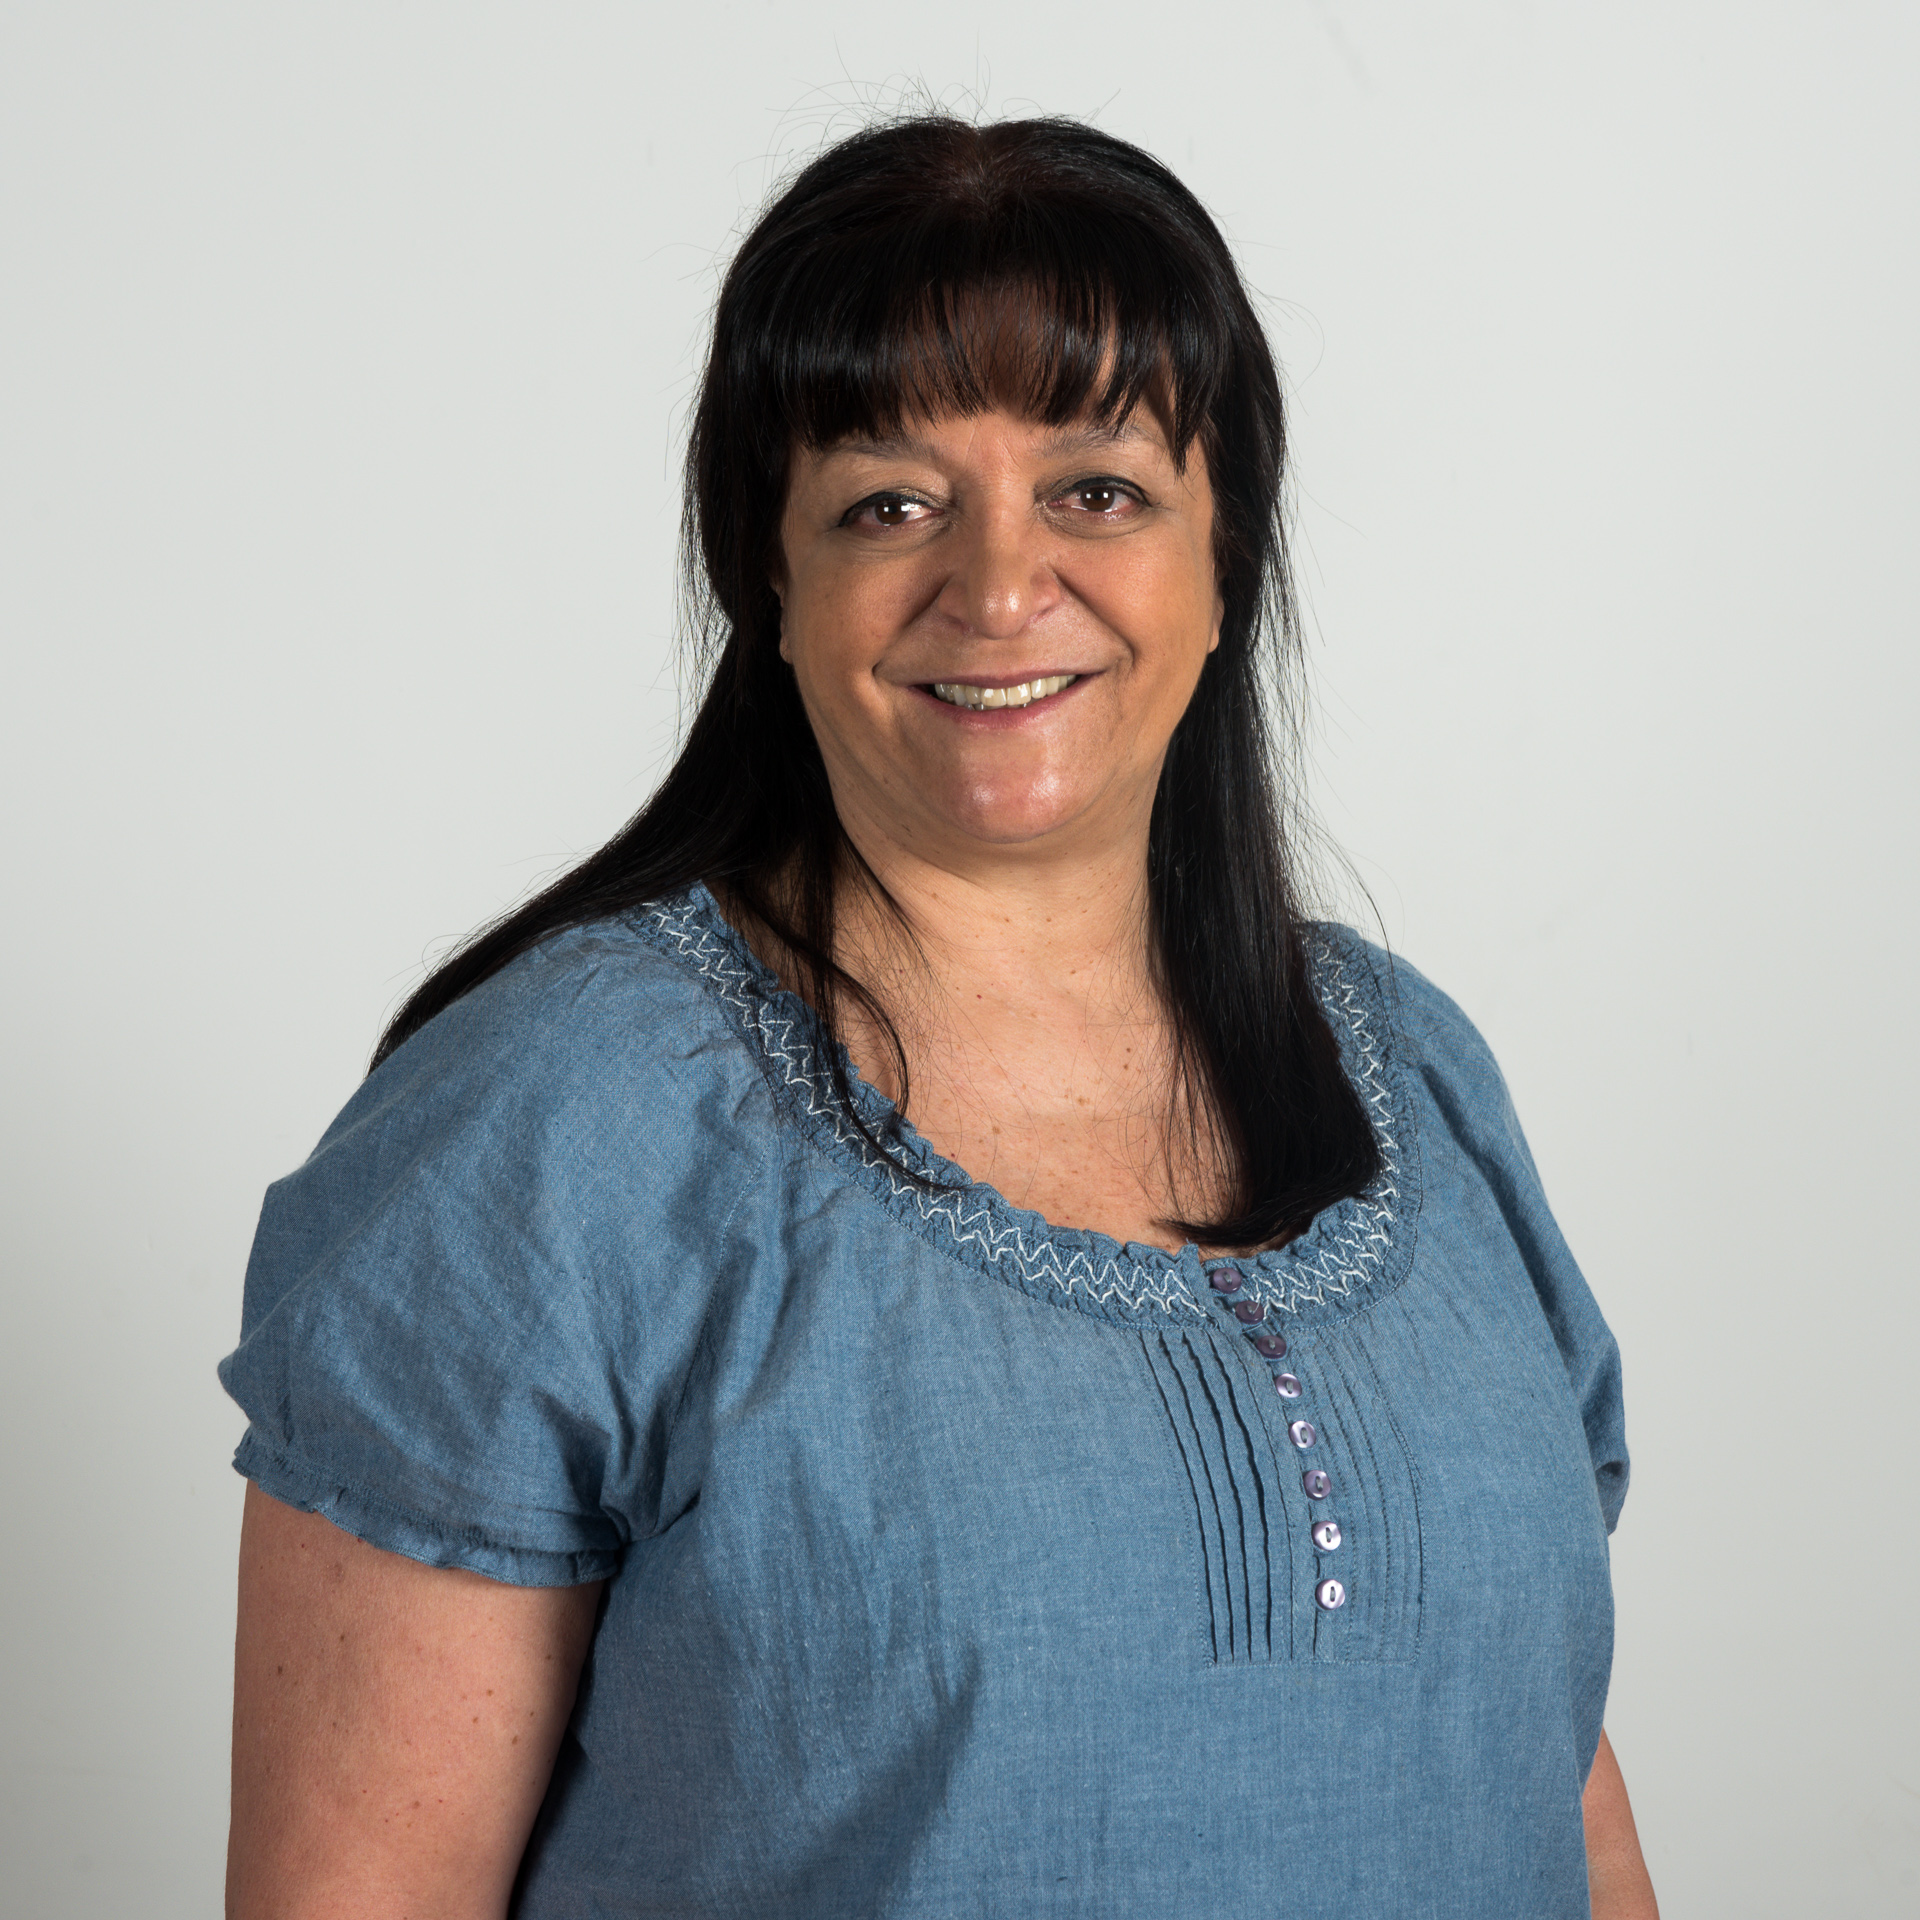 Gabriela Deut